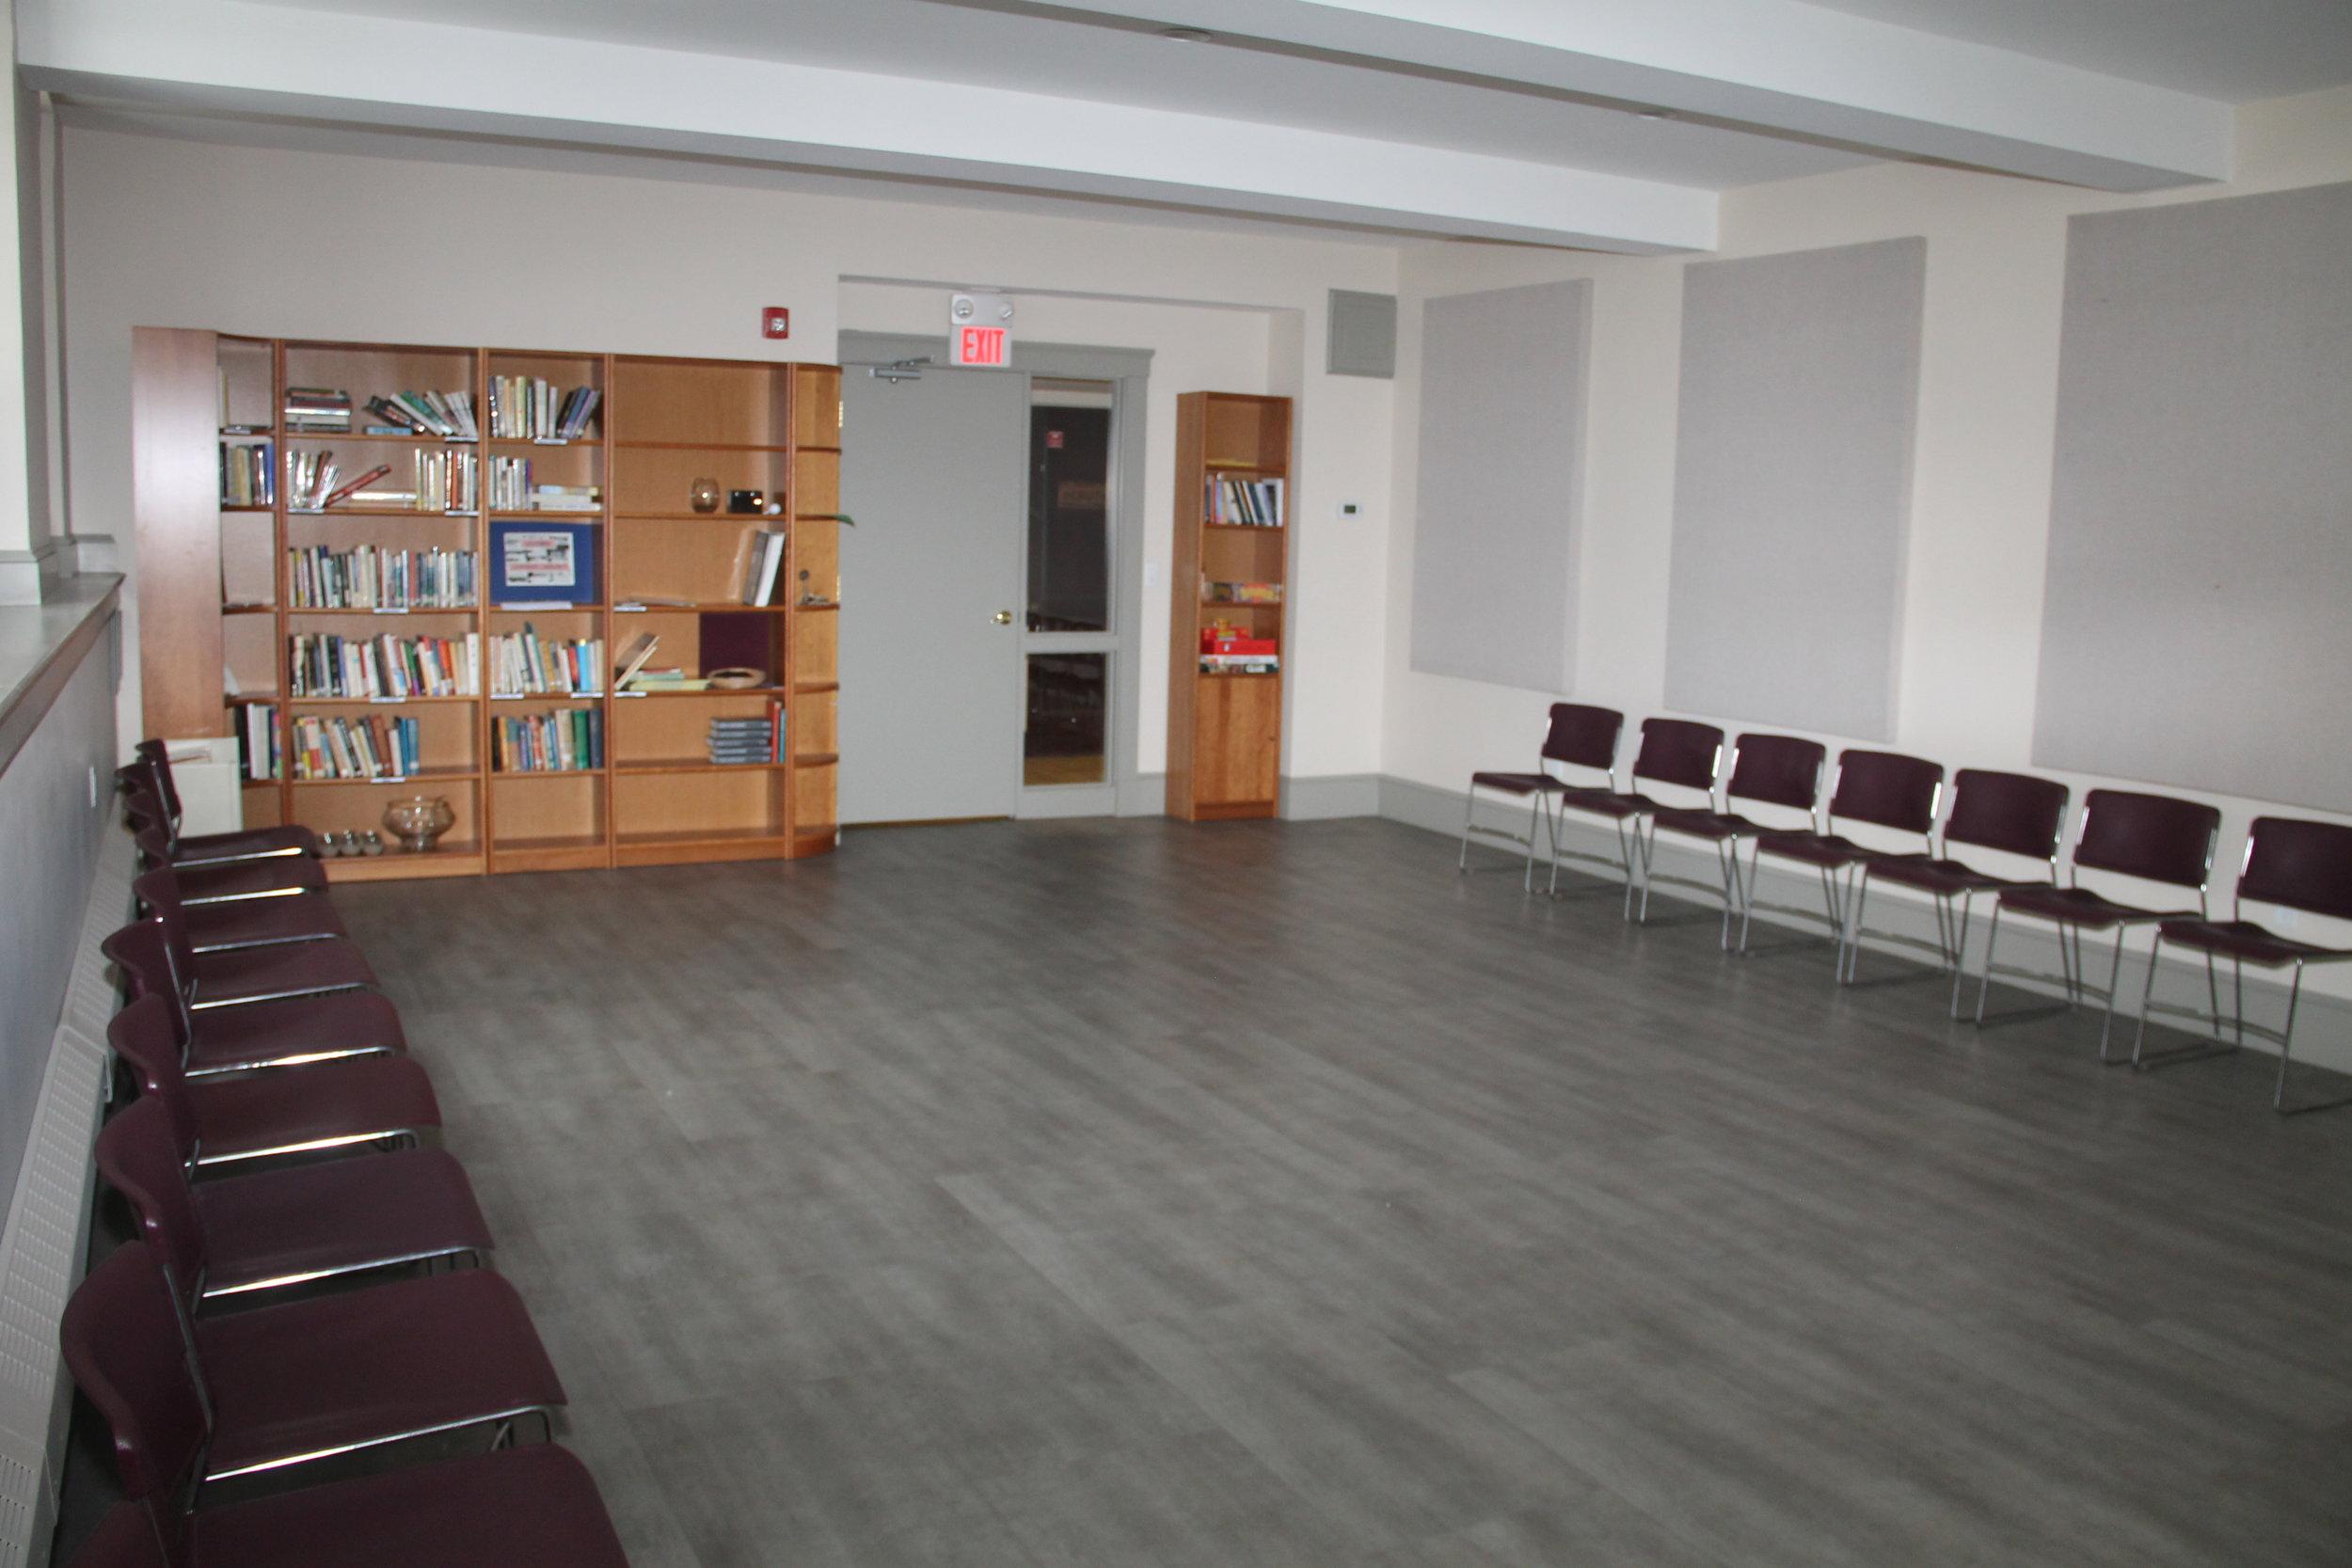 multi-purpose room CAPACITY: 30 $150/ 4 hours FOR NON-MEMBERS $75/ 4 hours FOR NON-MEMBERS